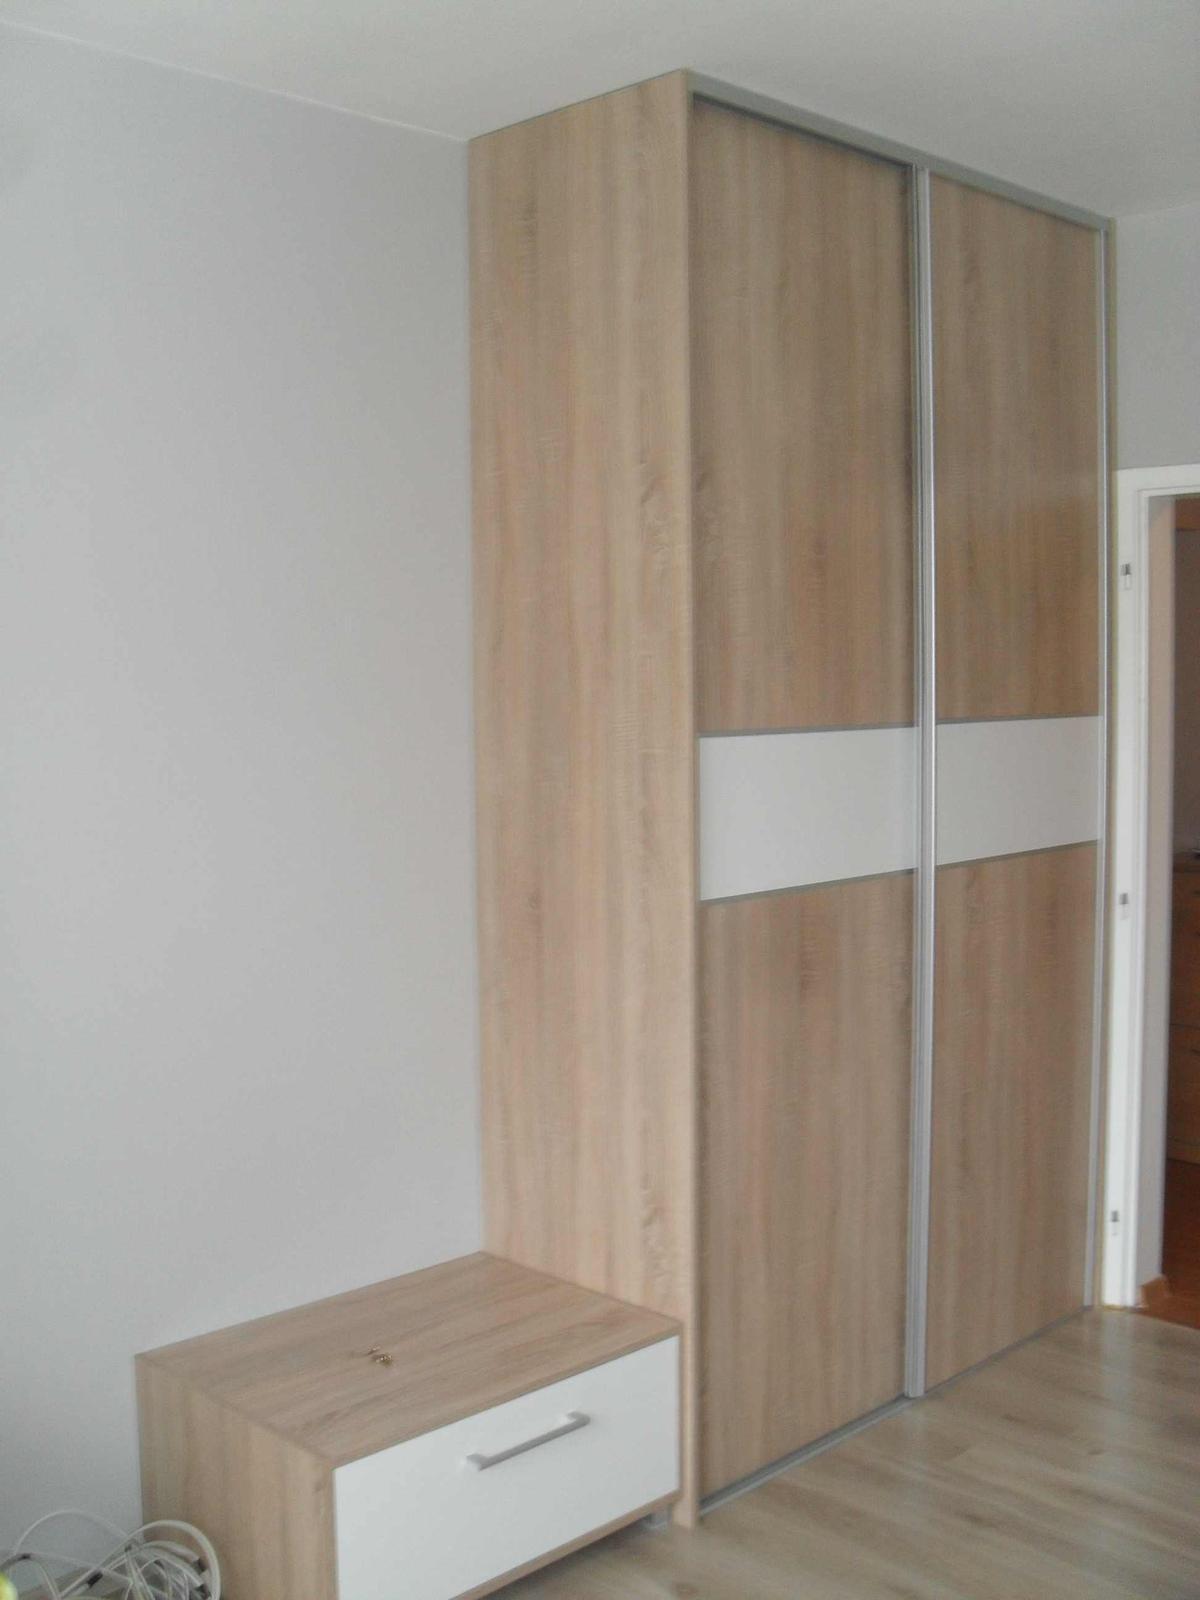 Vstavané skrine Martin Benko Bošany - Obrázok č. 3